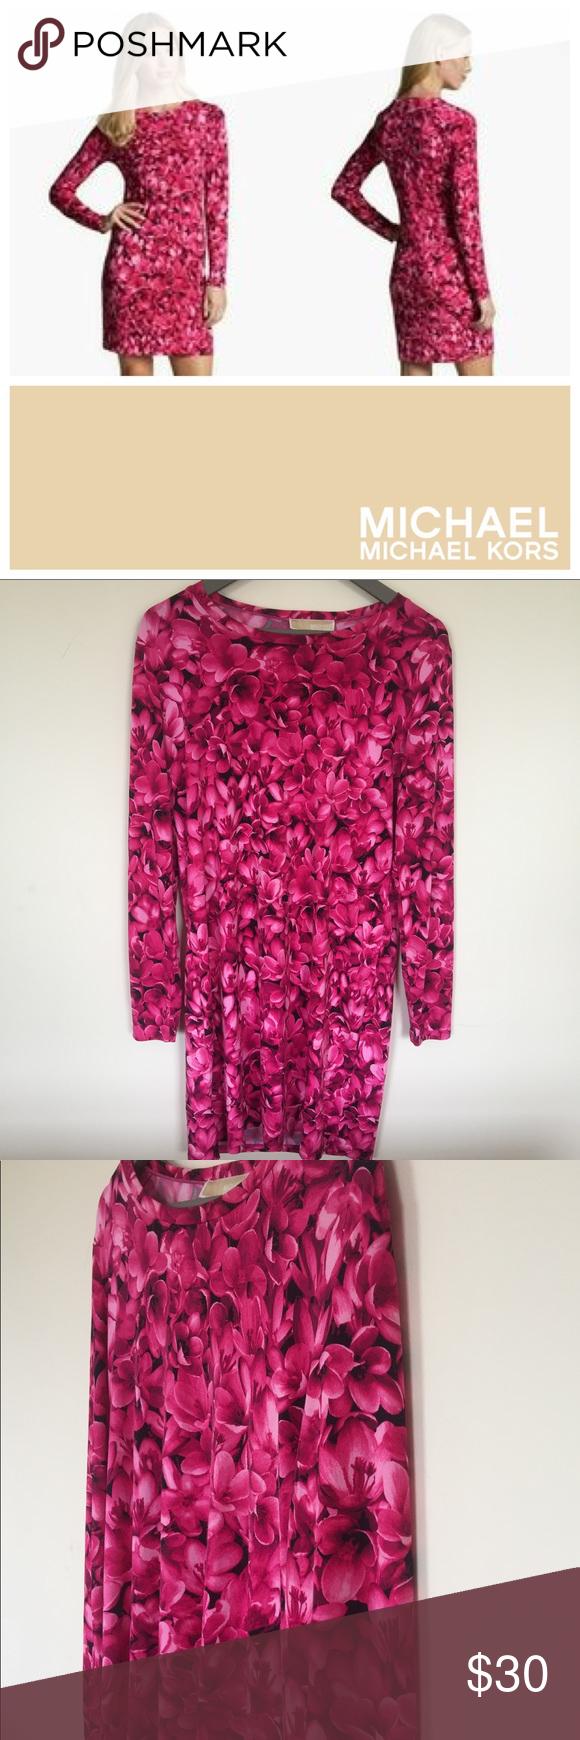 Soldmichael michael kors floral shift dress spandex fabric